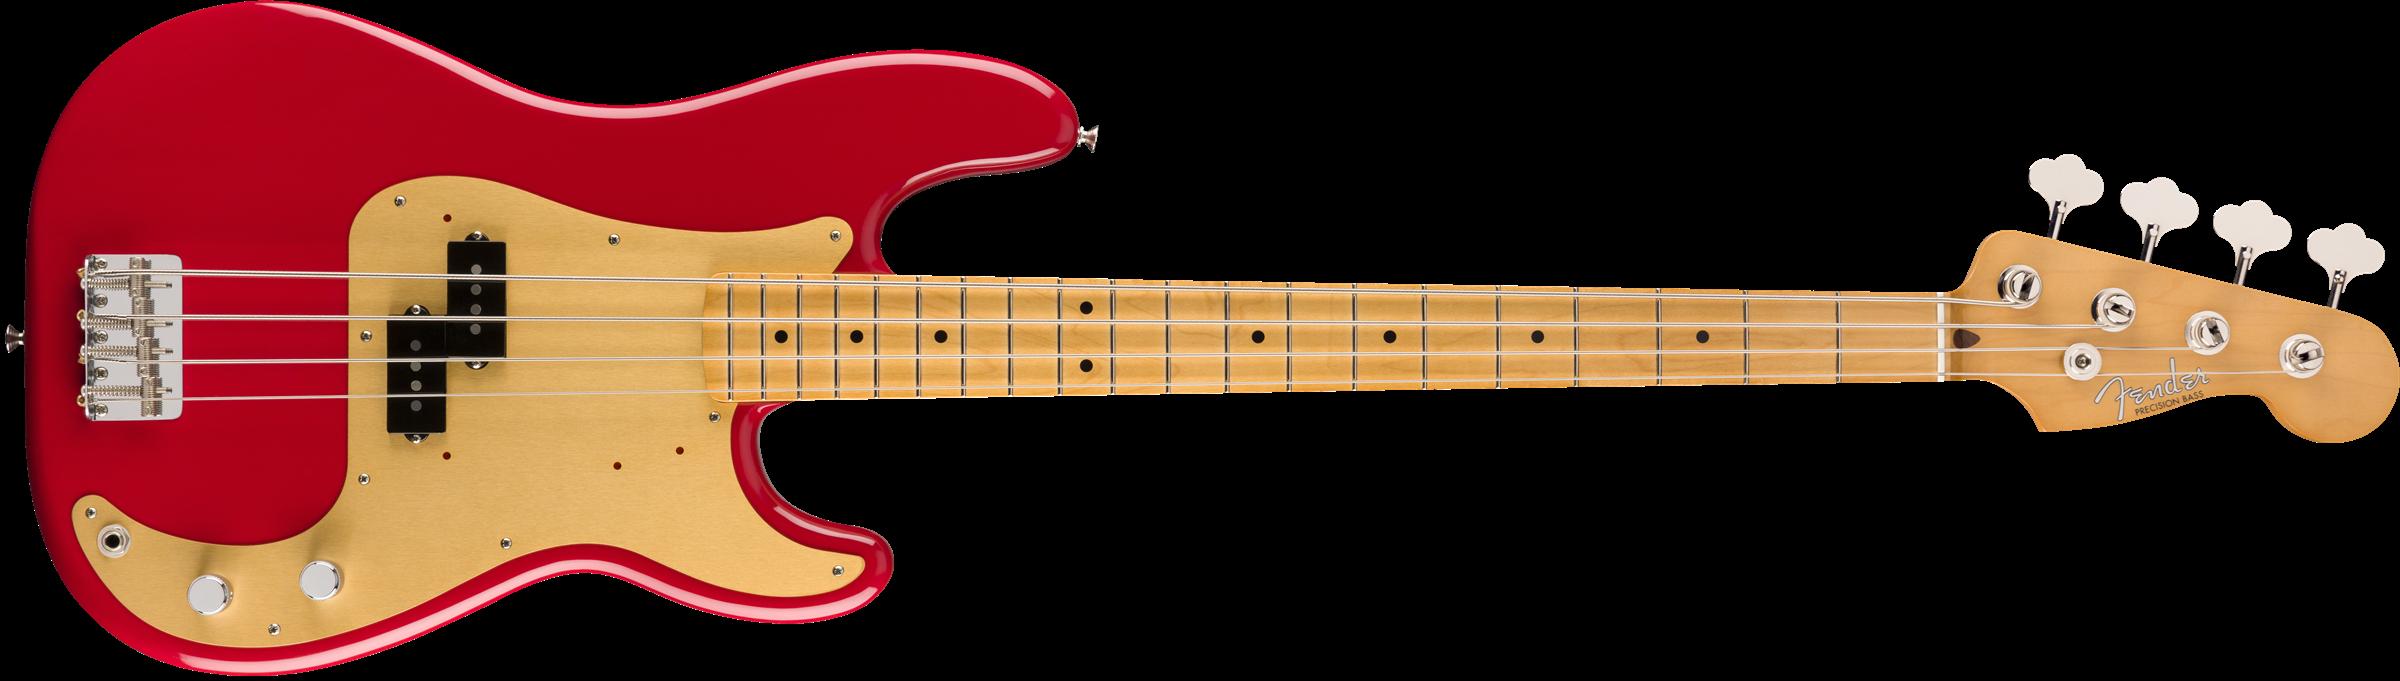 Fender Vintera P-Bass 50 Dakota Red